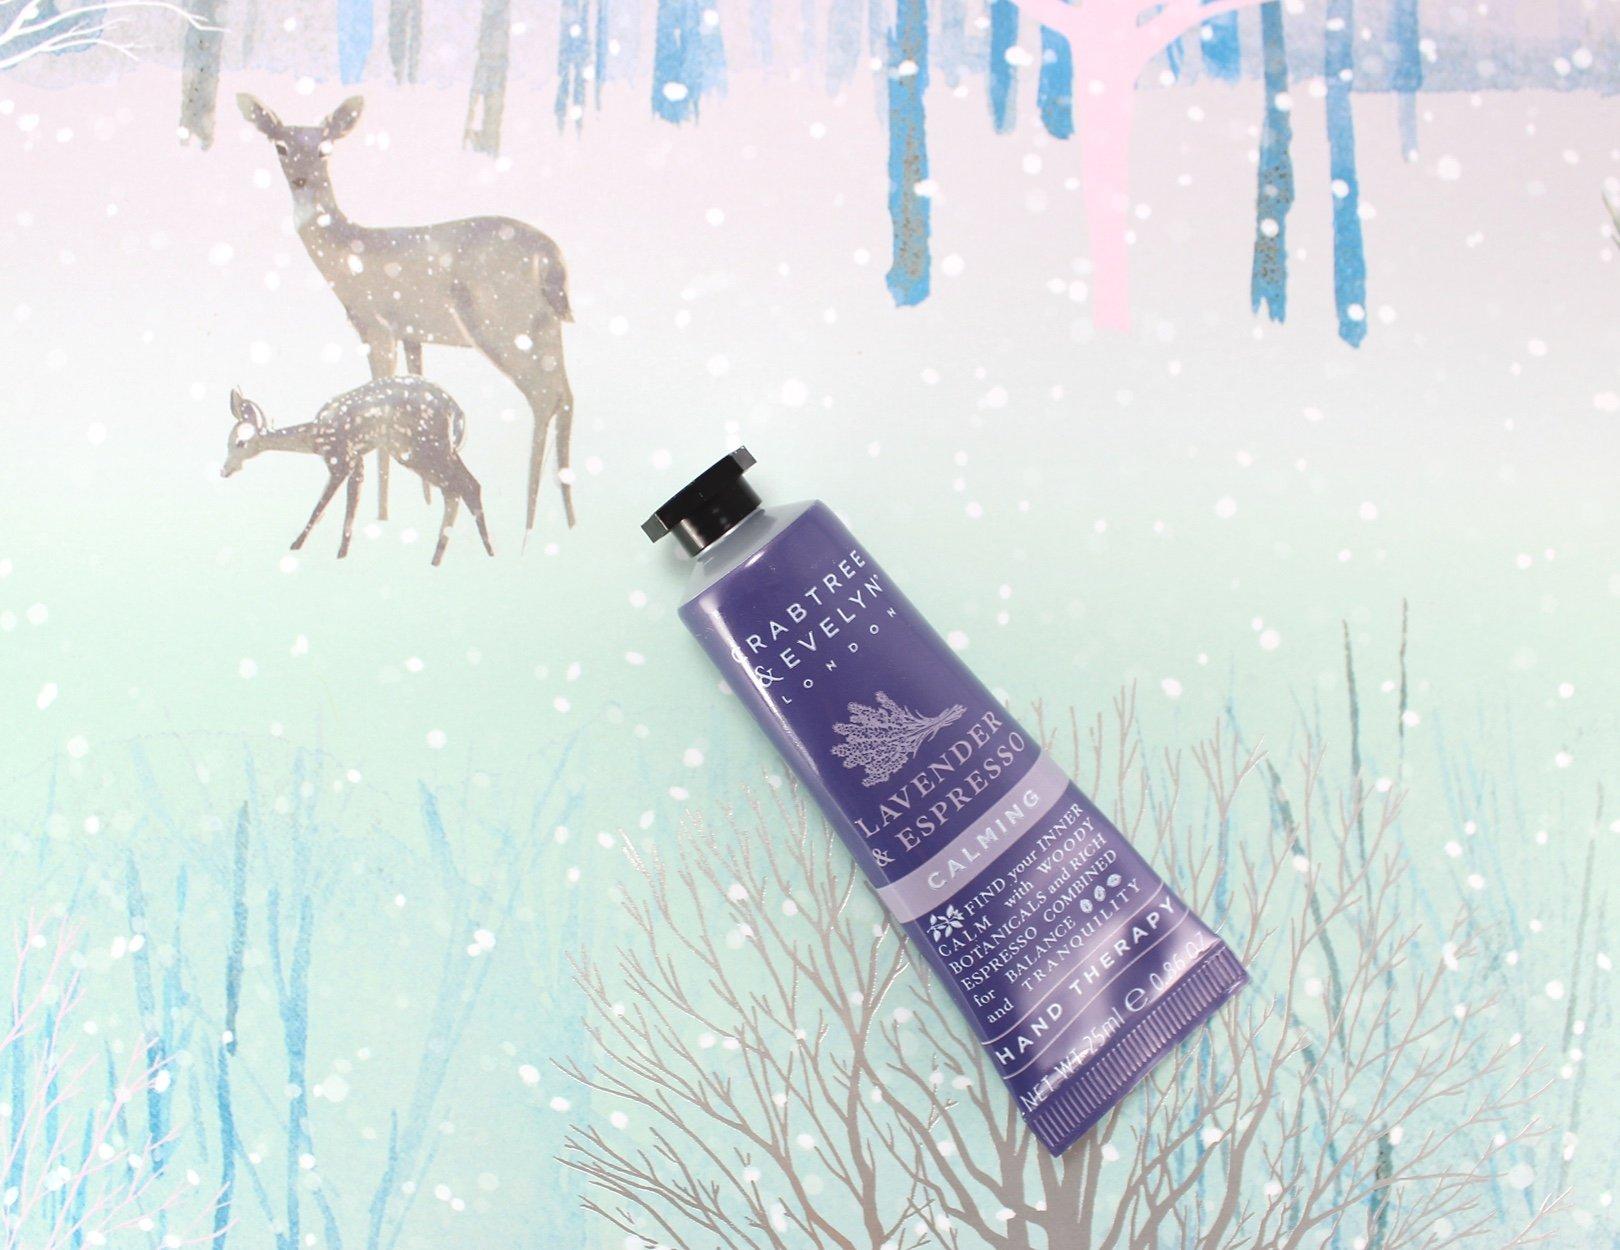 12 days of crabtree & evelyn advent calendar – lavender espresso